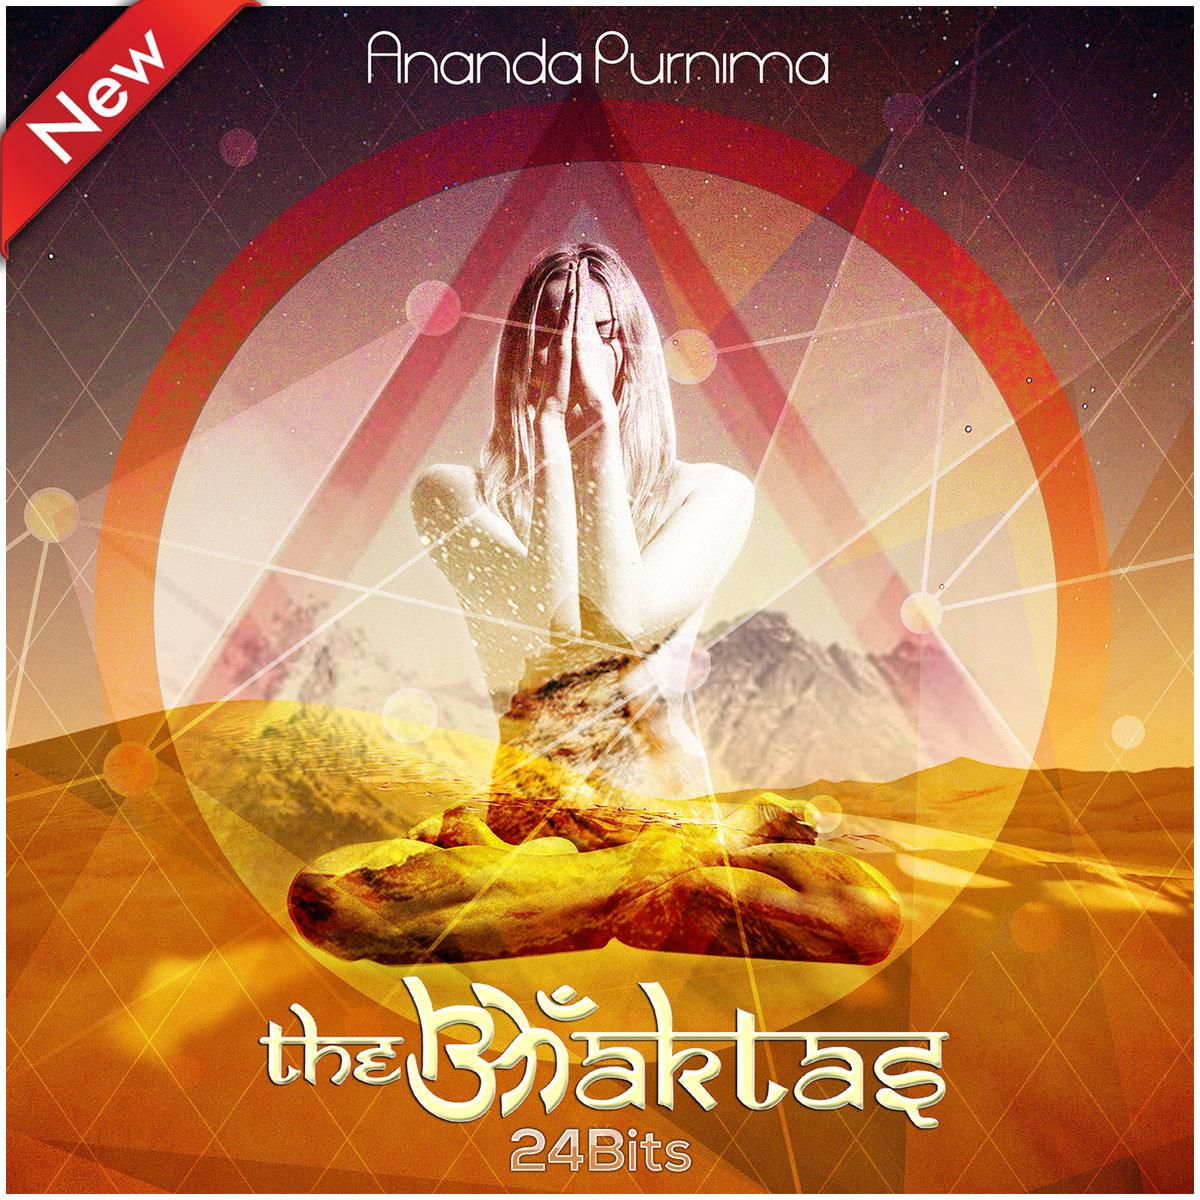 The Bhaktas - Ananda Purnima VI @ 'Ananda Purnima' album (ananda purnima altar records, ananda purnima bhaktas)